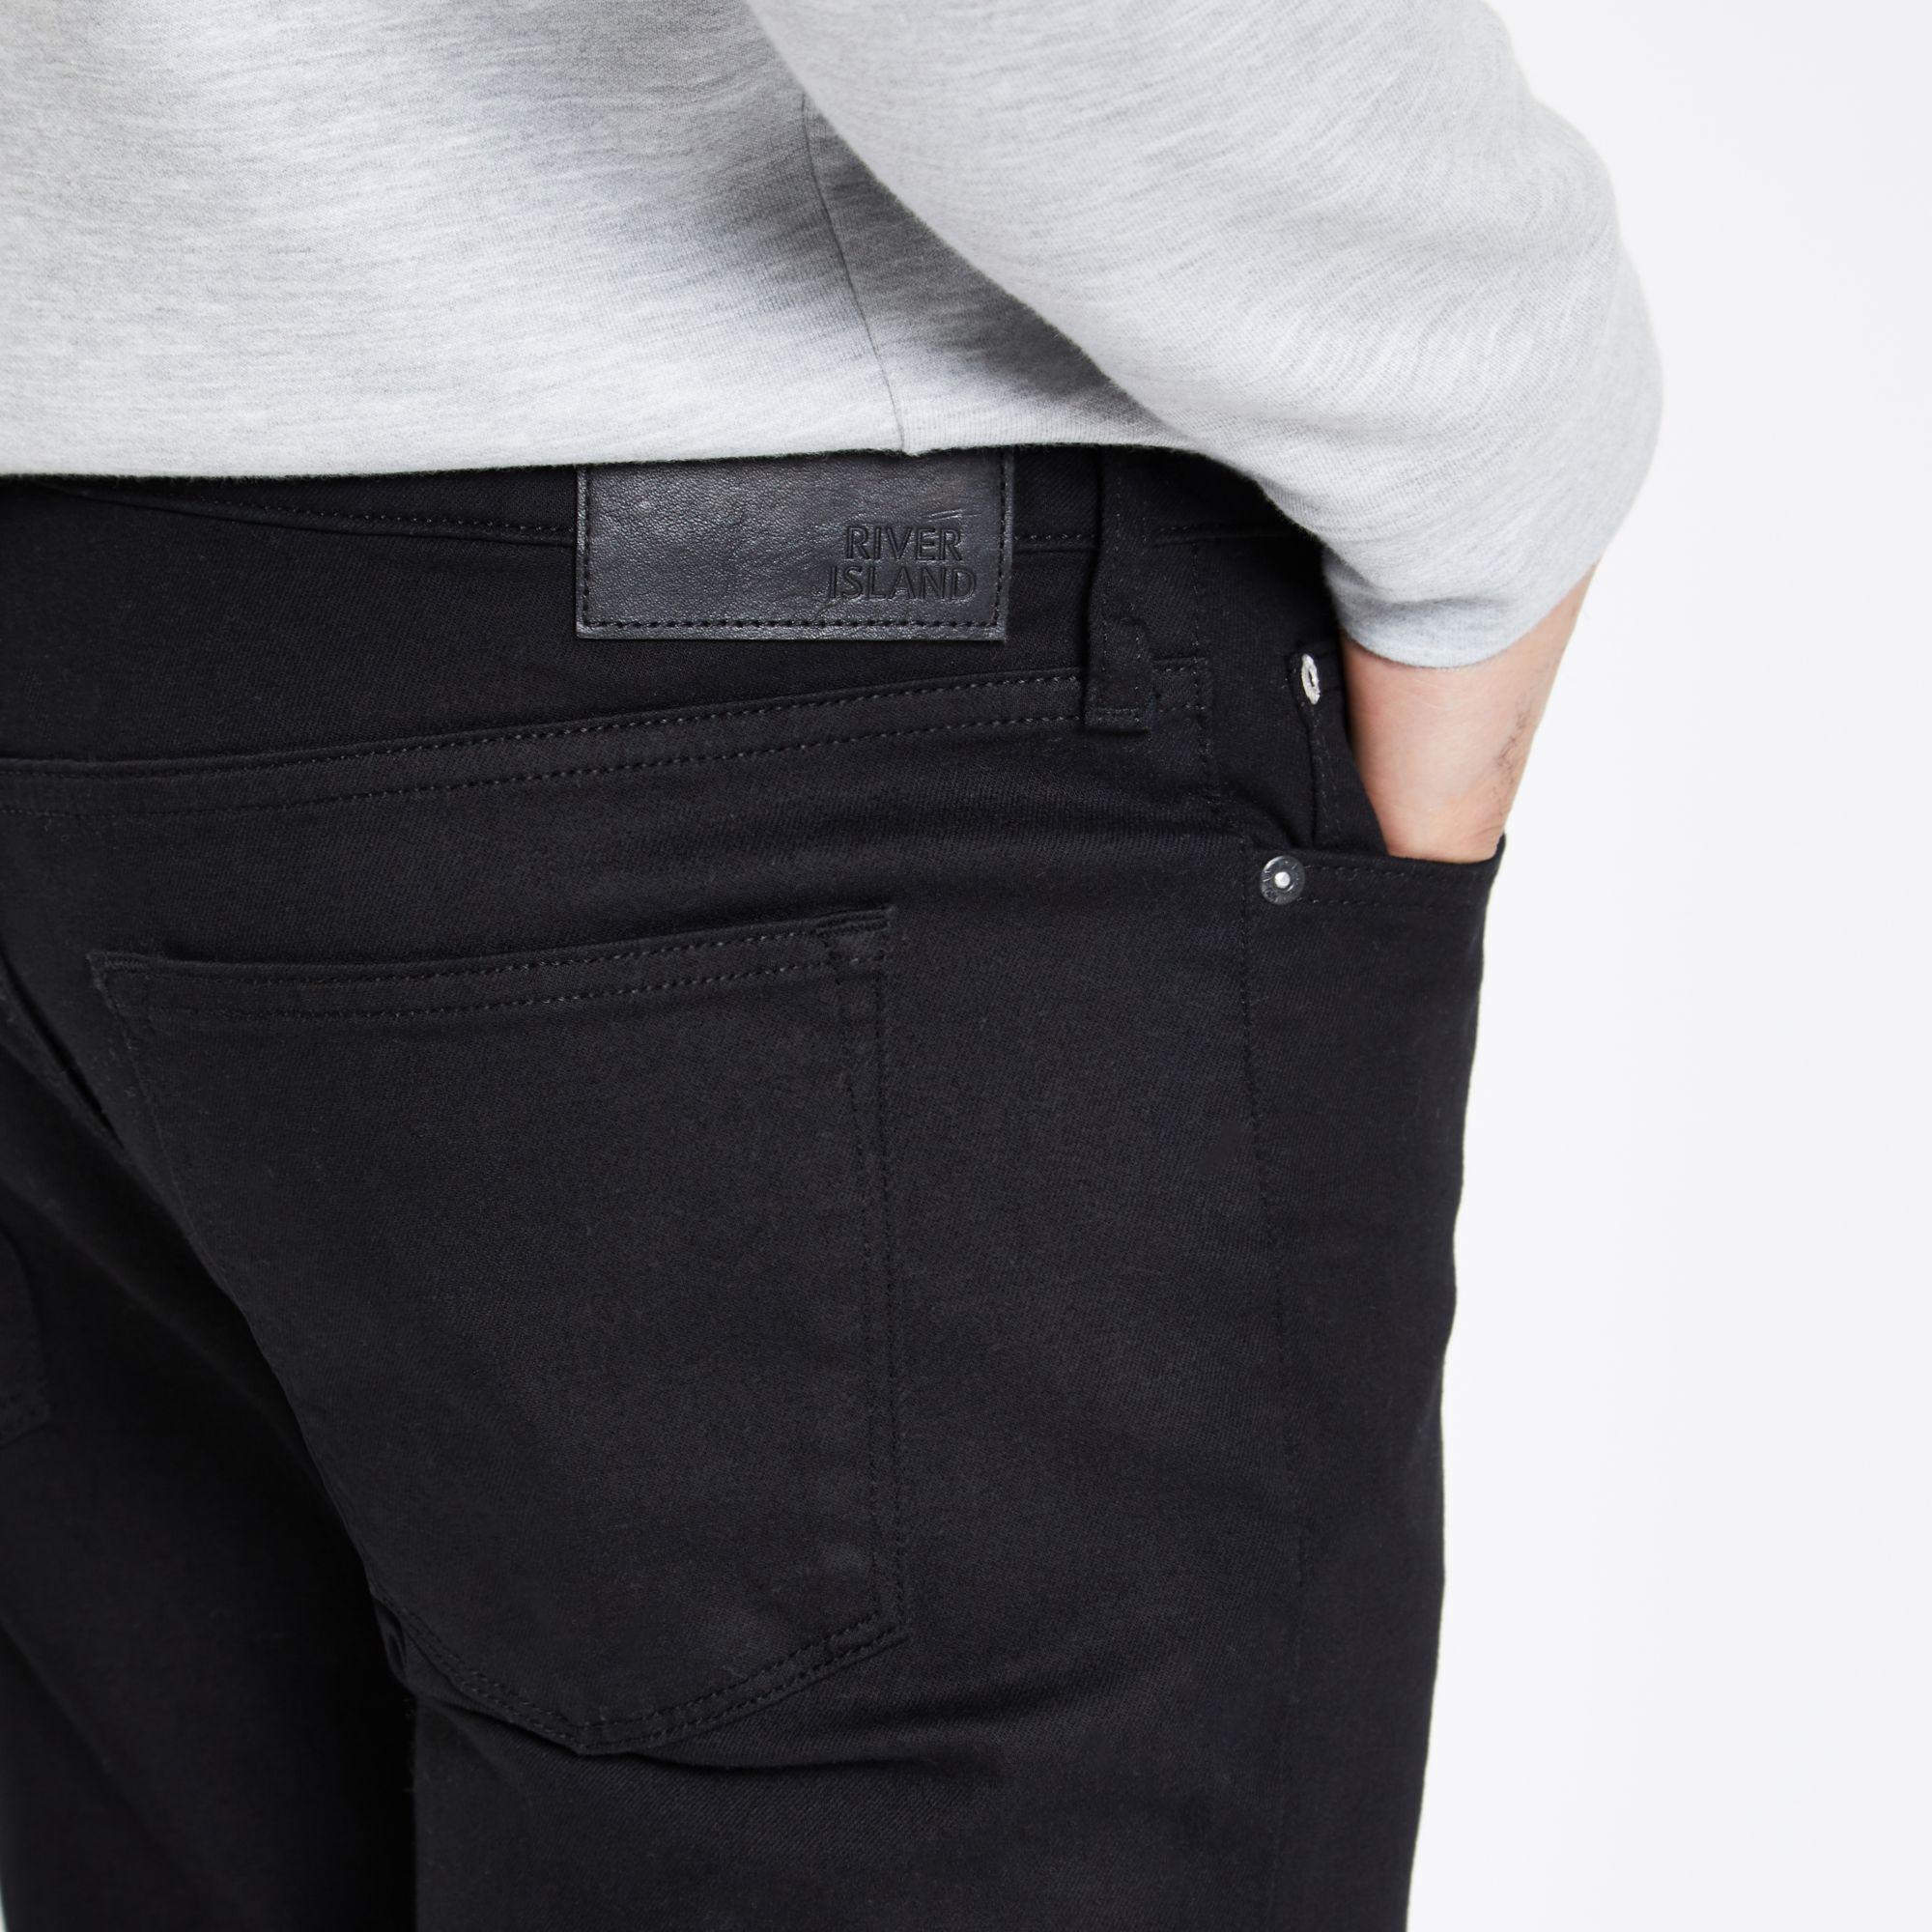 0095b7336 ... Black Slim Fit Dylan Jeans for Men - Lyst. View fullscreen